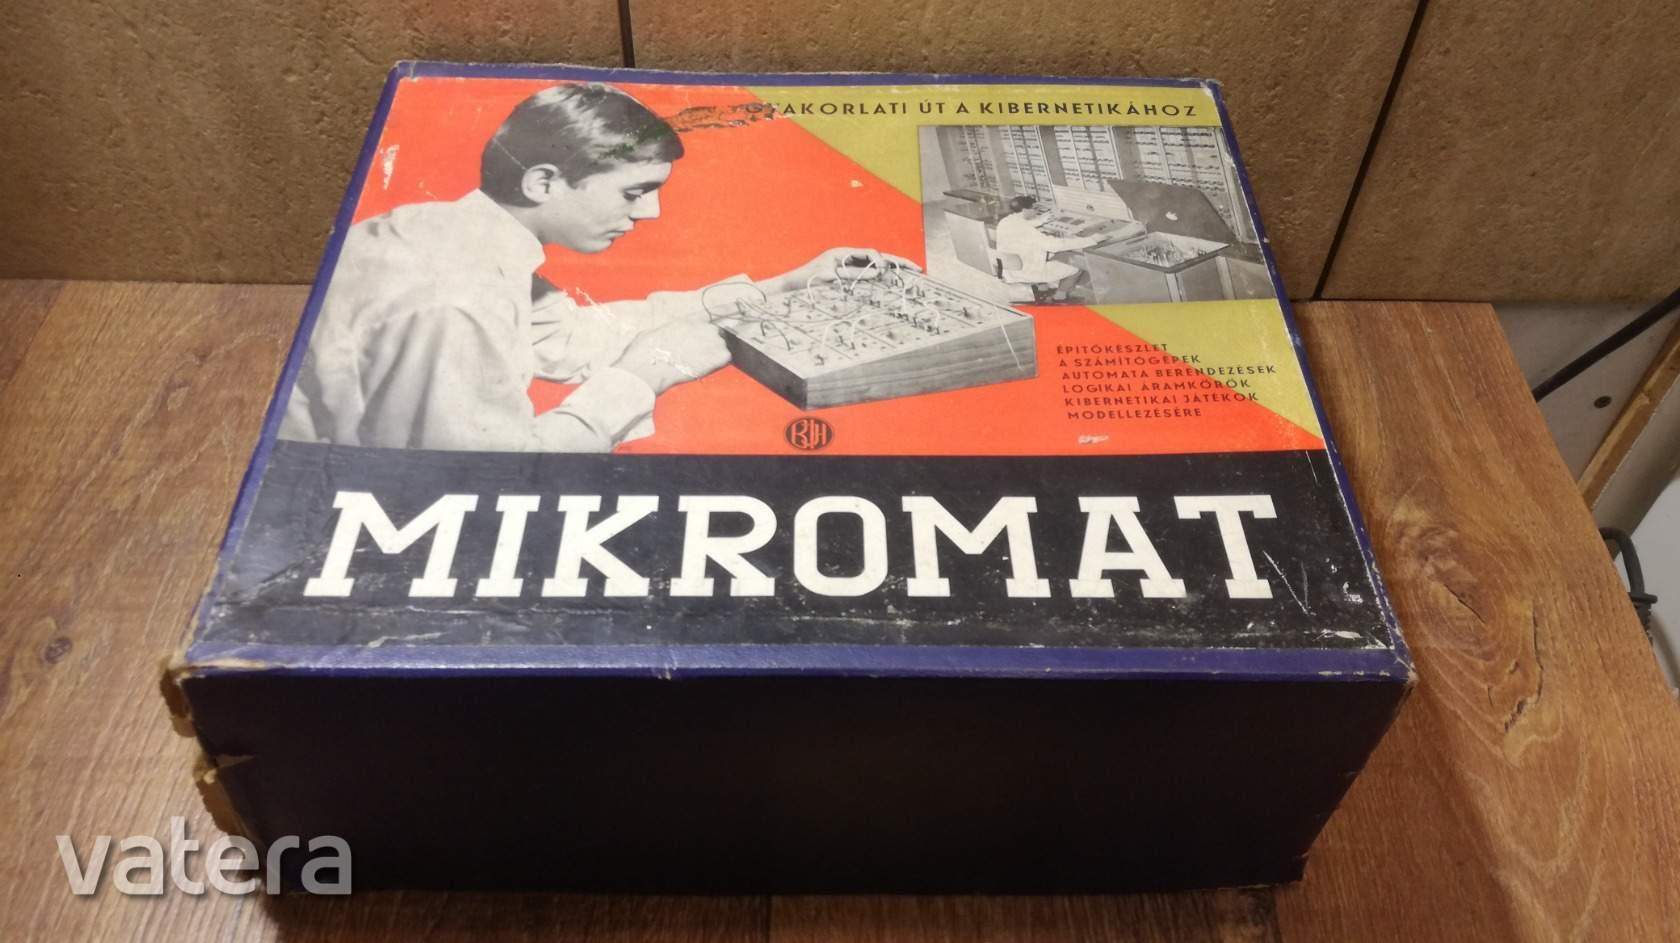 mikromat-gyakorlati-ut-a-kibernetikahoz-epitokeszlet-1967-e45b_1_big.jpg